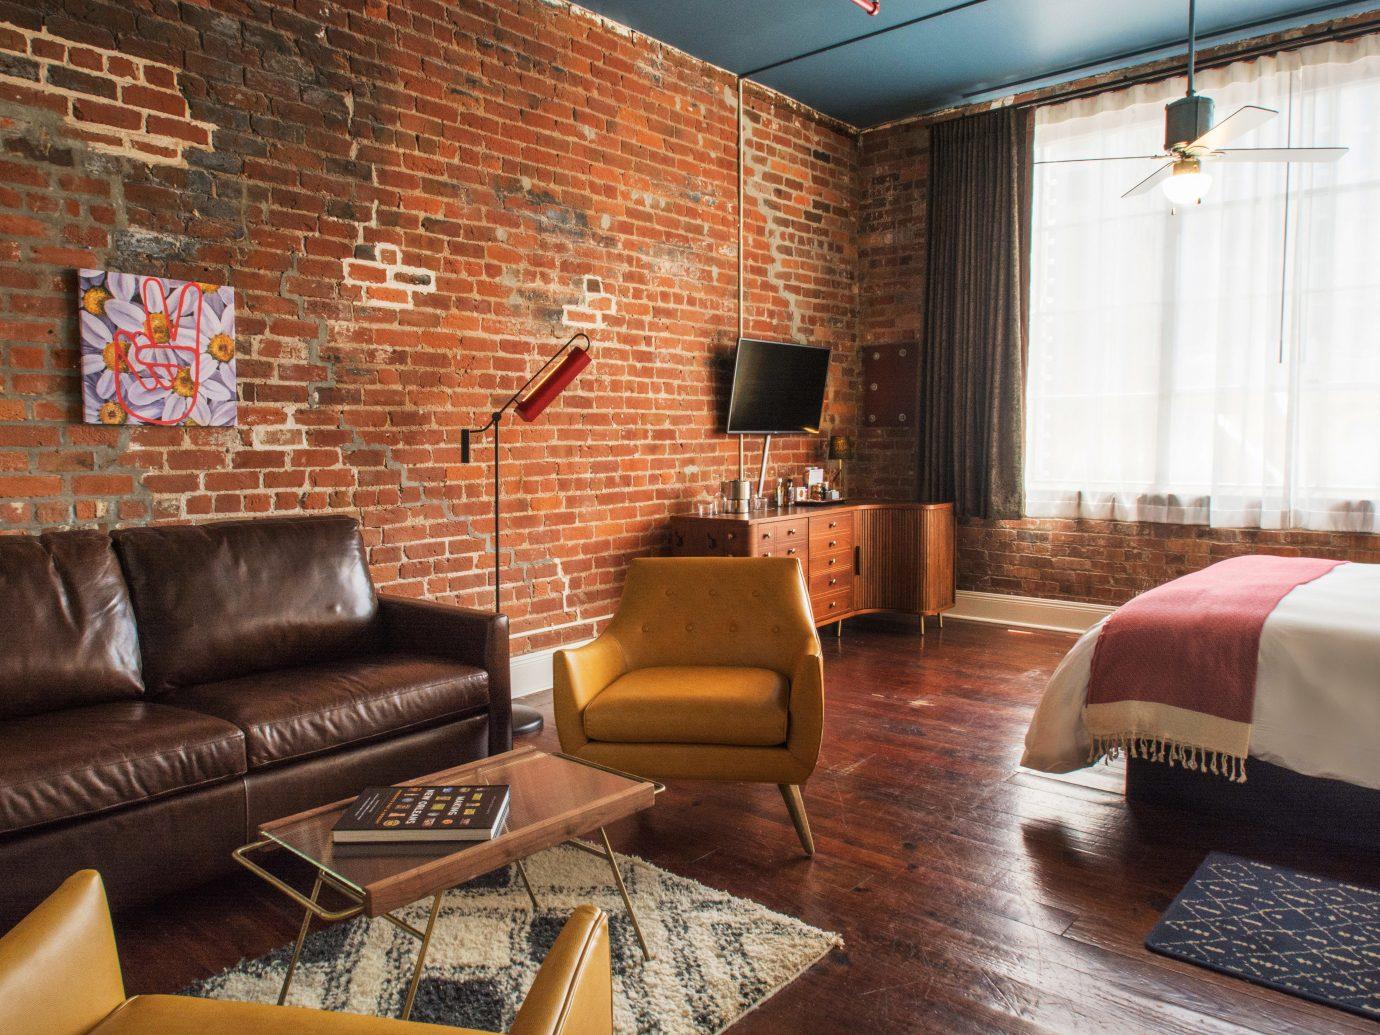 Bedroom Hotels Luxury Romantic Rustic Suite Trip Ideas indoor sofa room Living floor property living room interior design home estate real estate hardwood cottage furniture